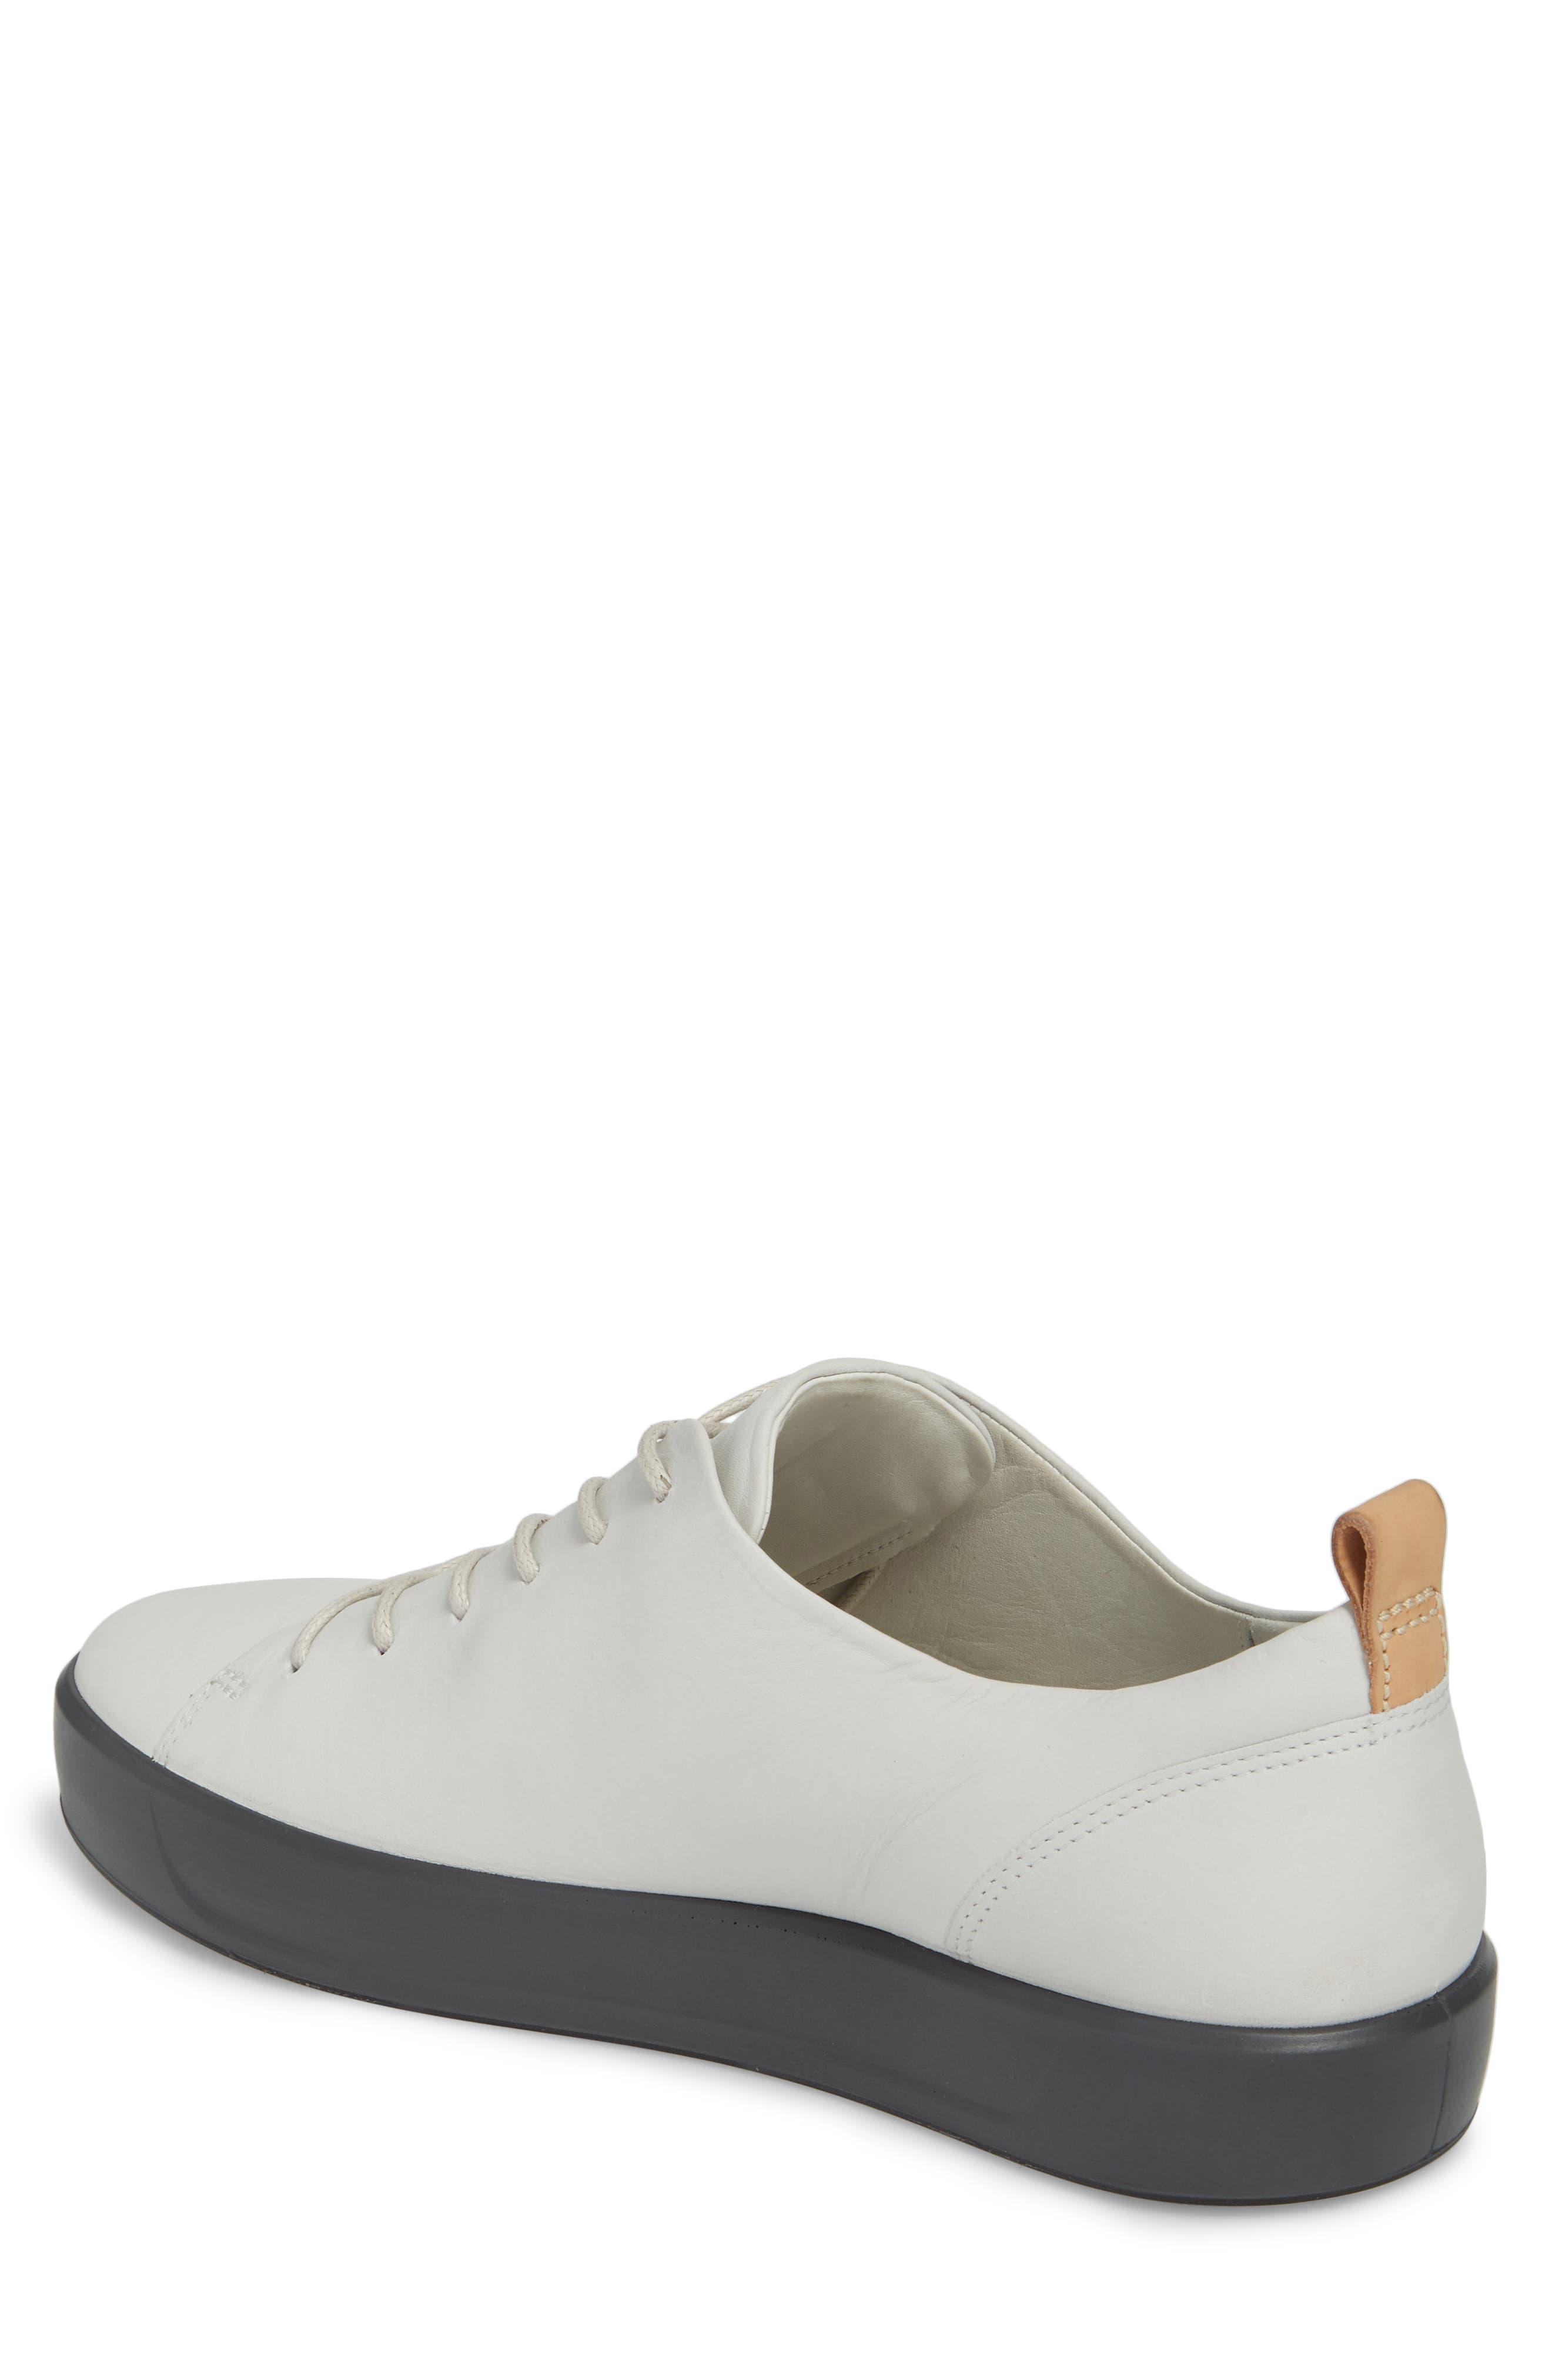 Soft 8 Low Top Sneaker,                             Alternate thumbnail 5, color,